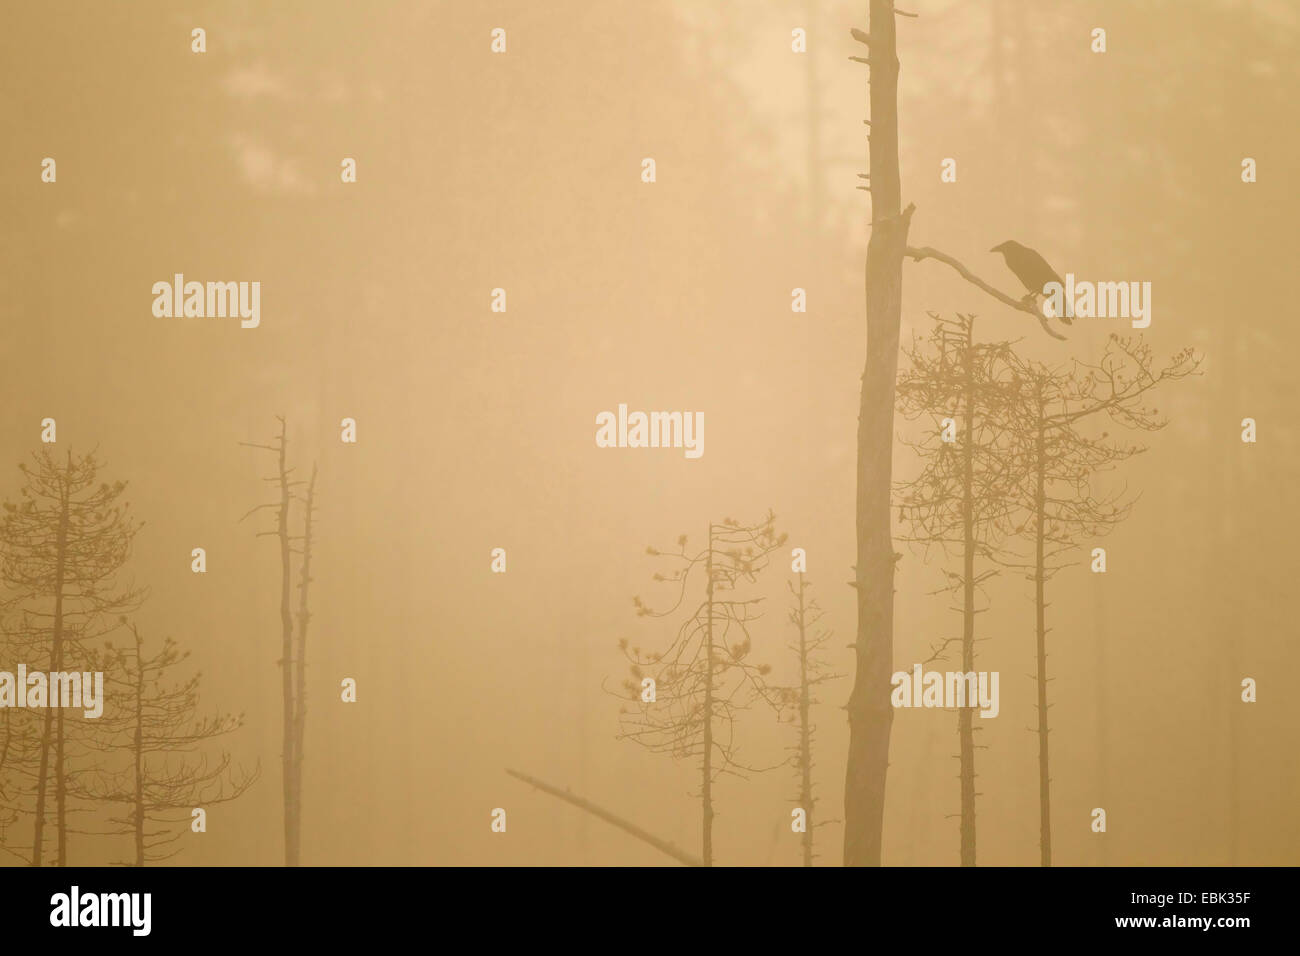 Kolkrabe (Corvus Corax) im Morgengrauen in borealen Wald, Finnland, Kuhmo Silhouette Stockbild